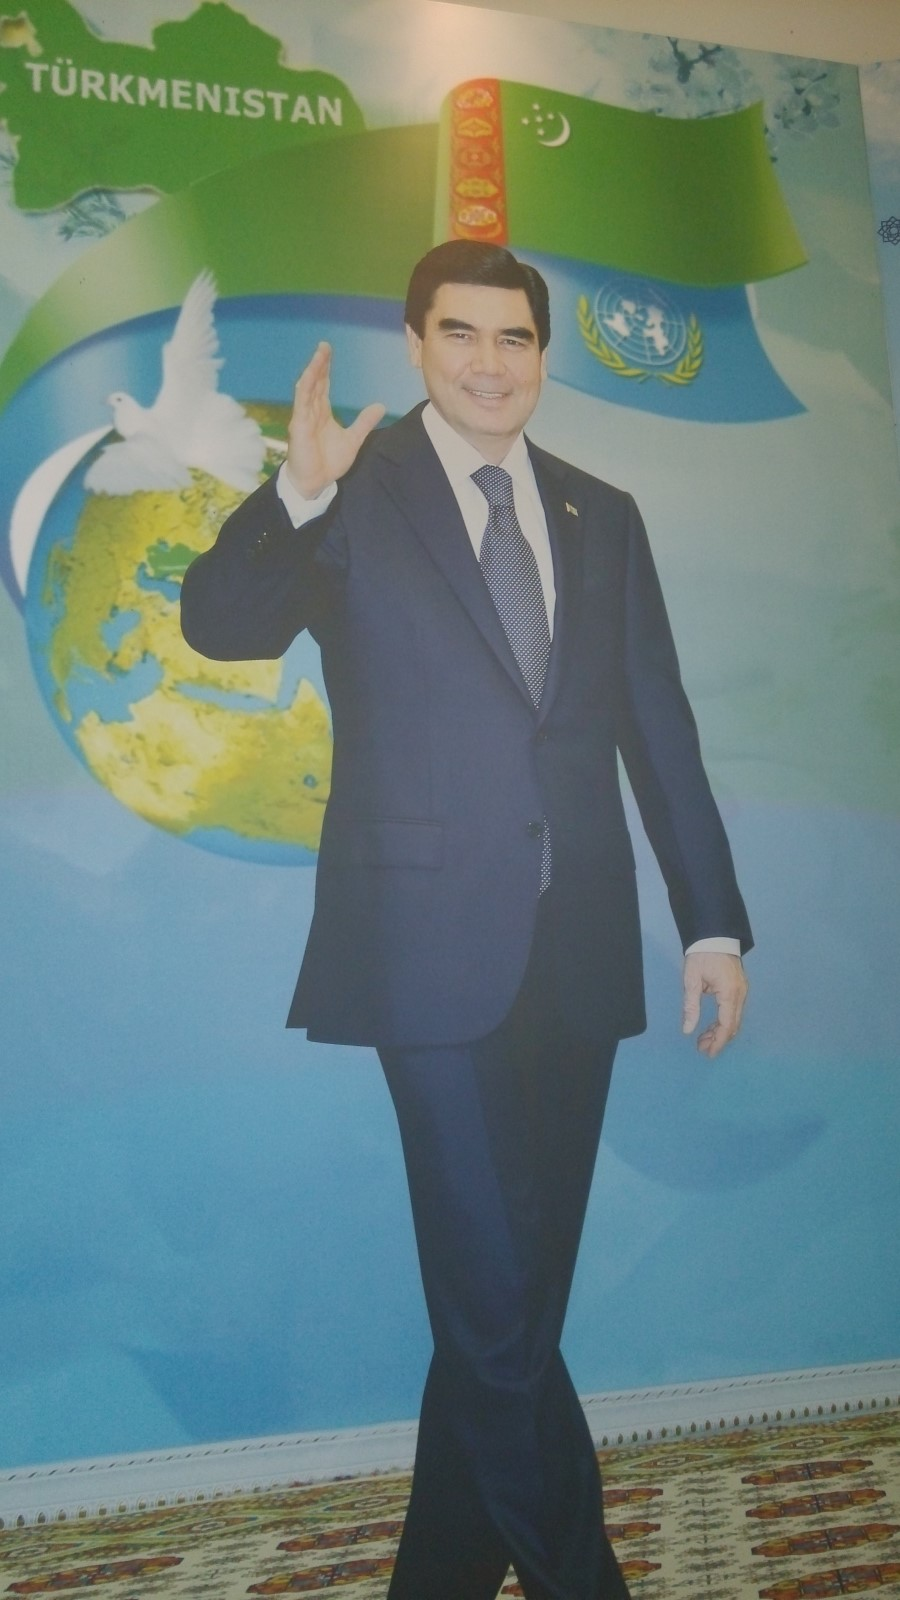 Türkmensiztán